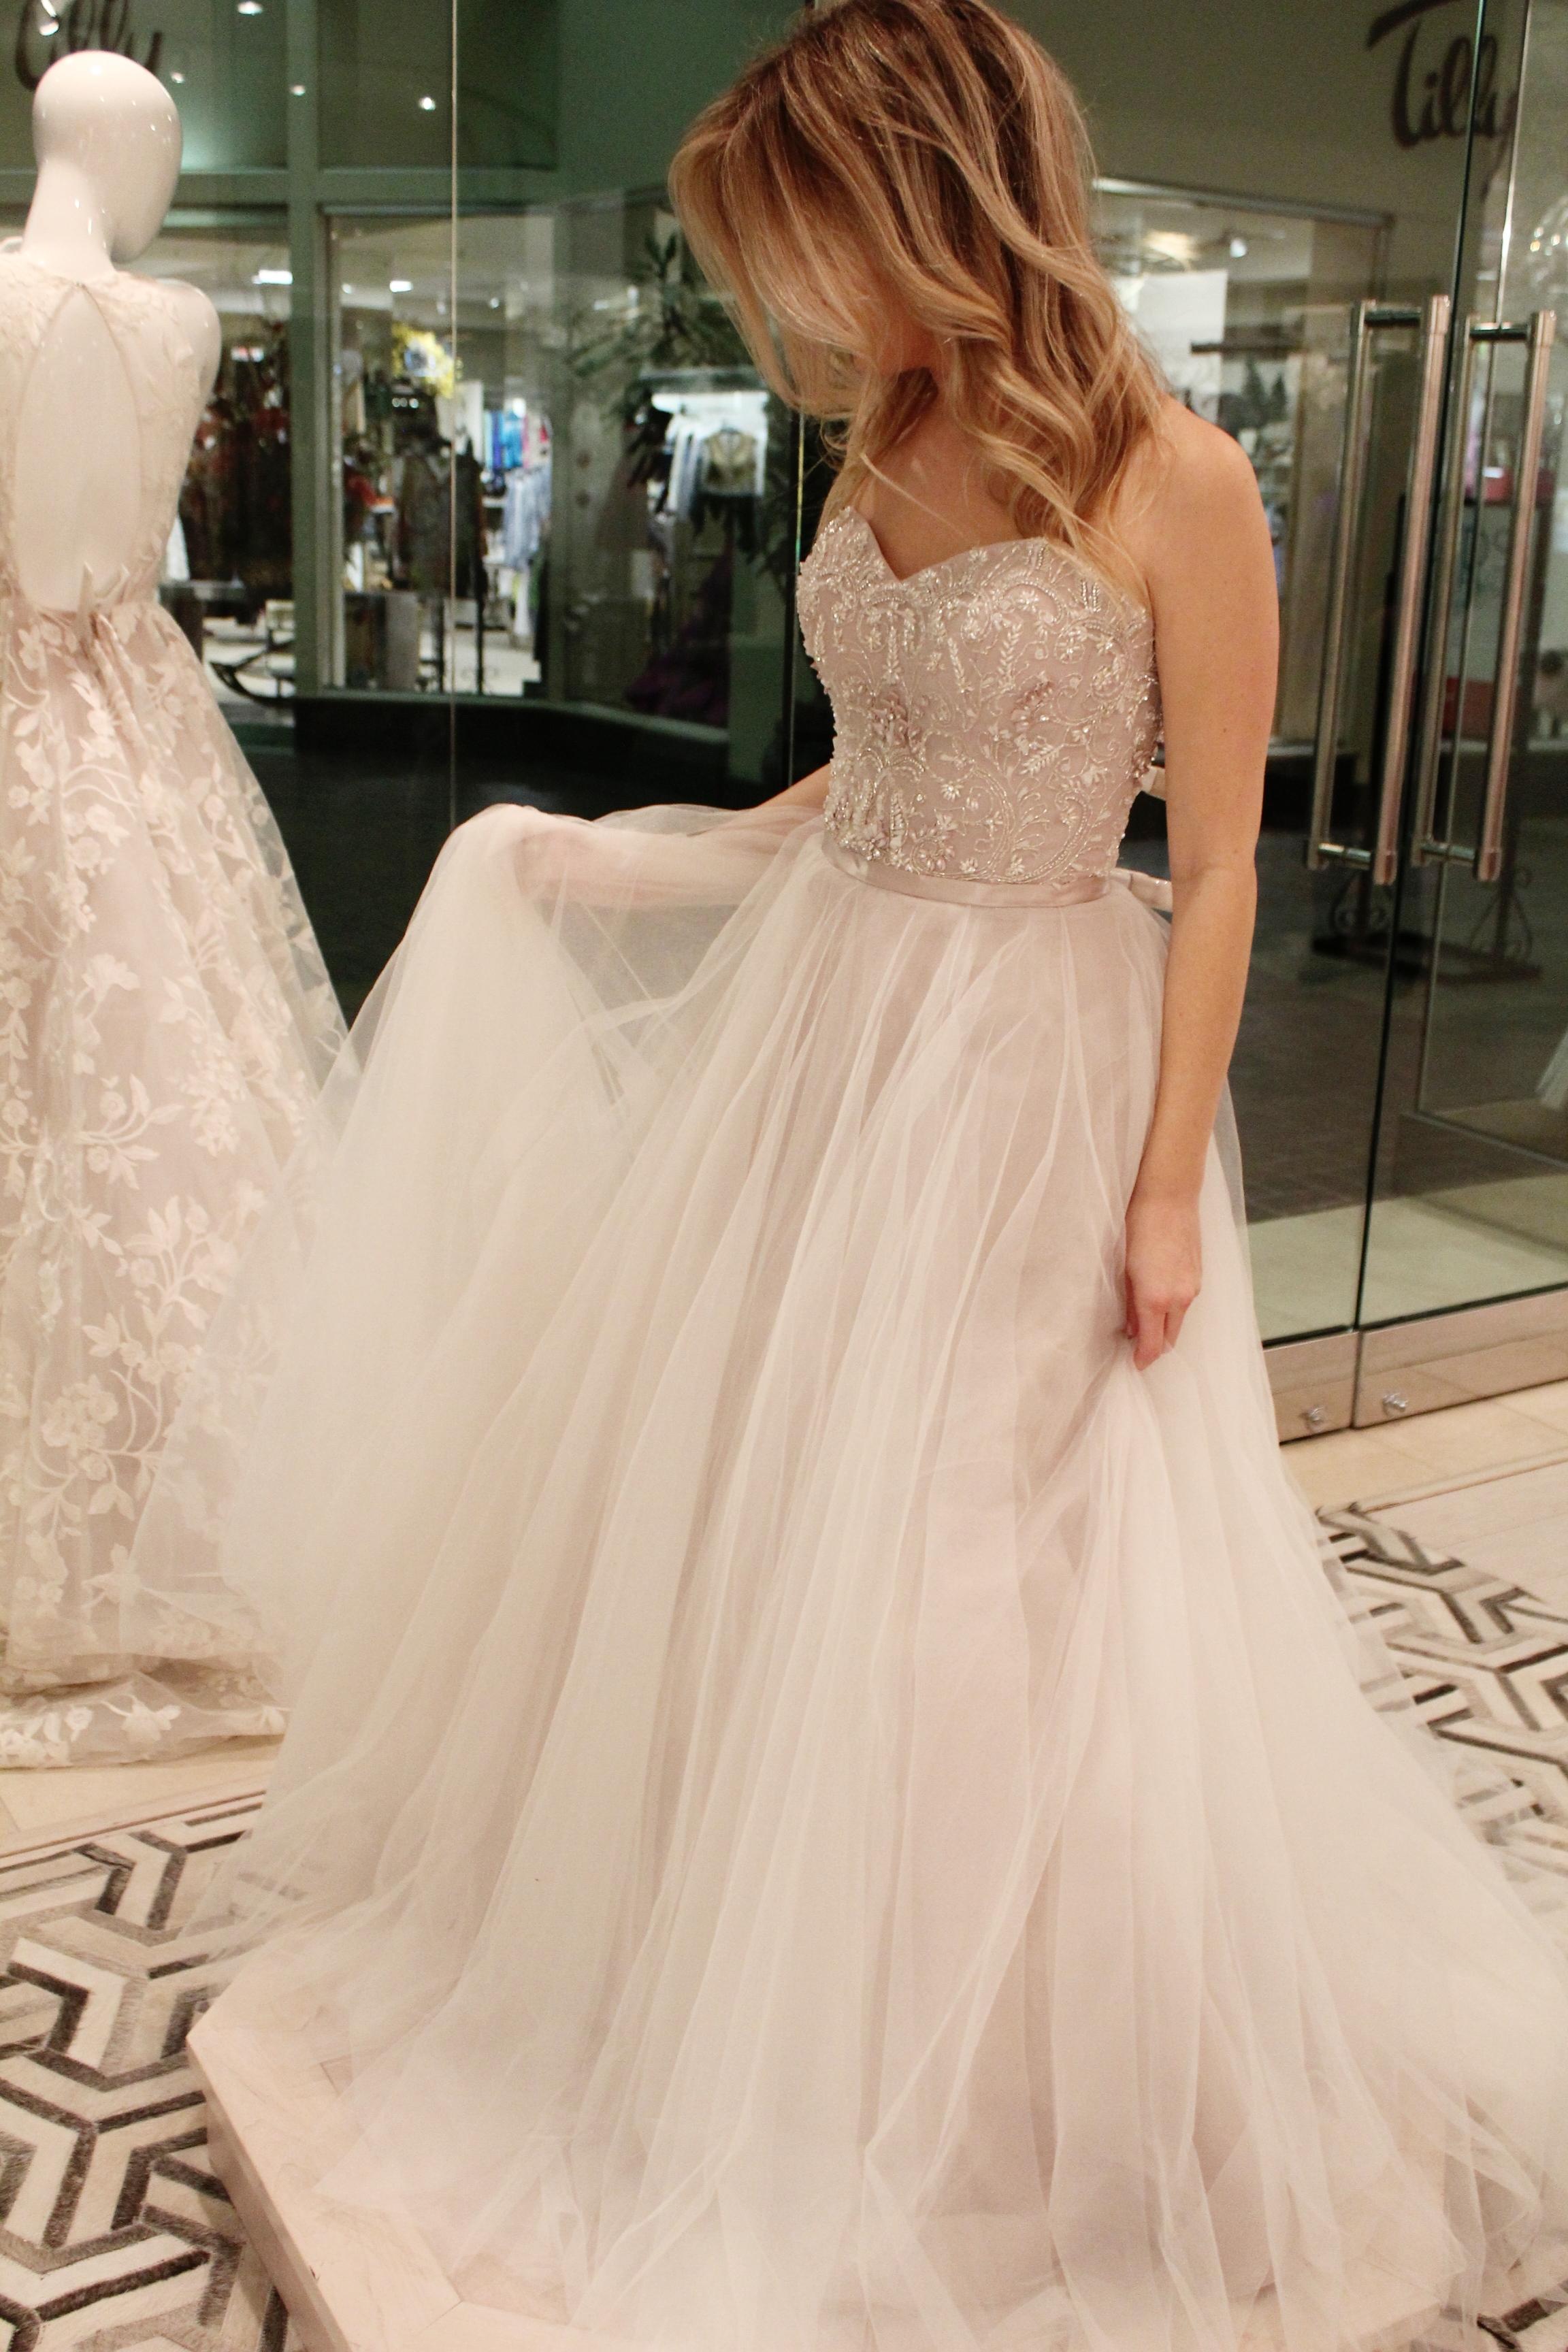 Wedding Dress Shopping Clocking Out,Sample Sale Wedding Dresses